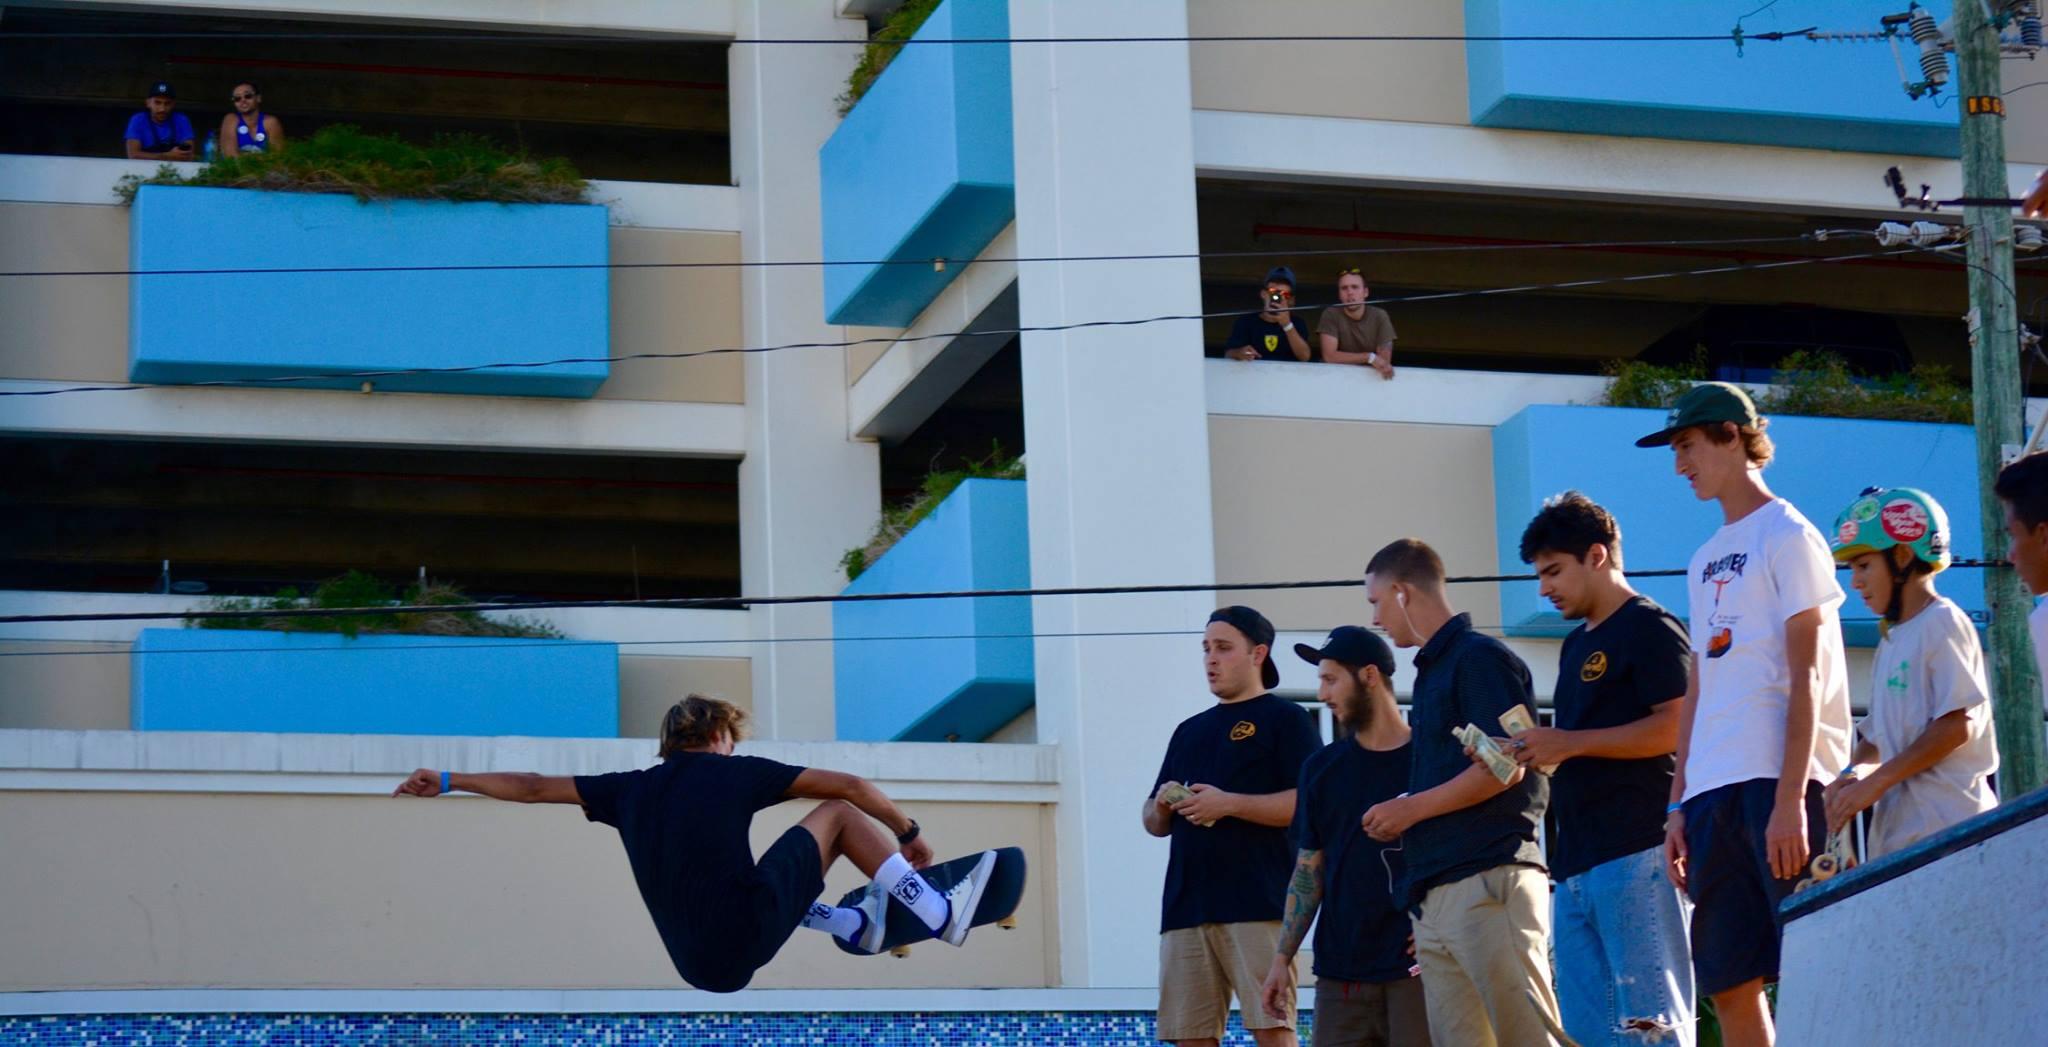 Skateboarding getting air